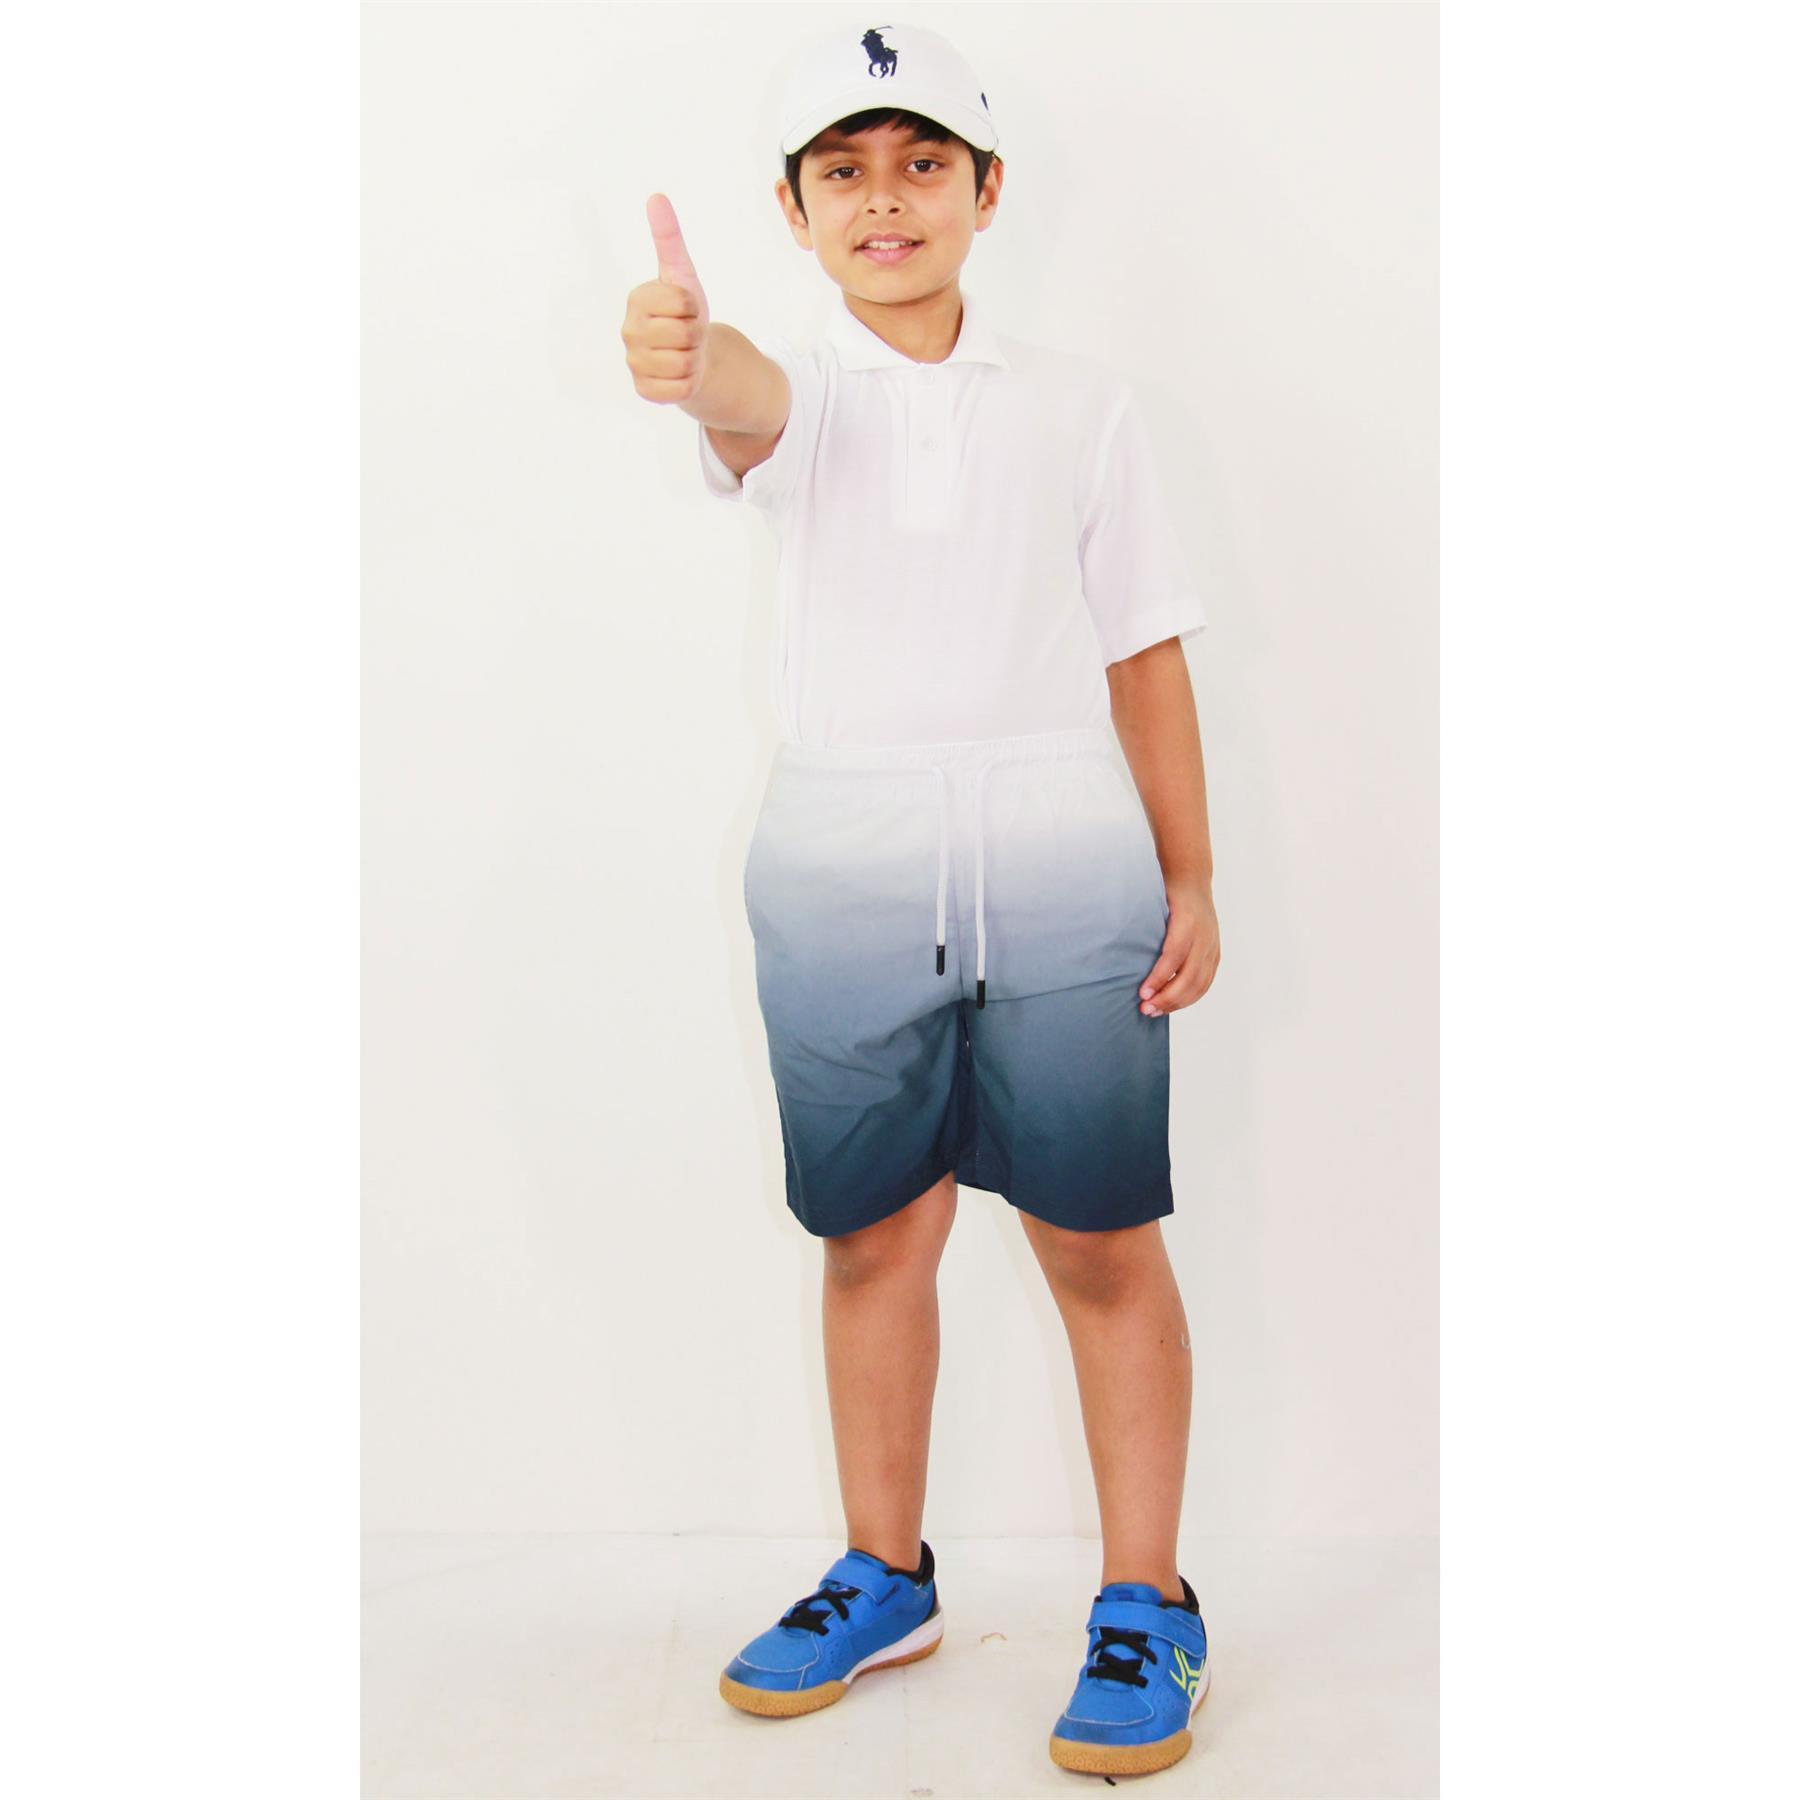 Boys New Grey Shorts Kids Summer Denim Jeans Knee Length Half Pants Age 8-16 Yrs